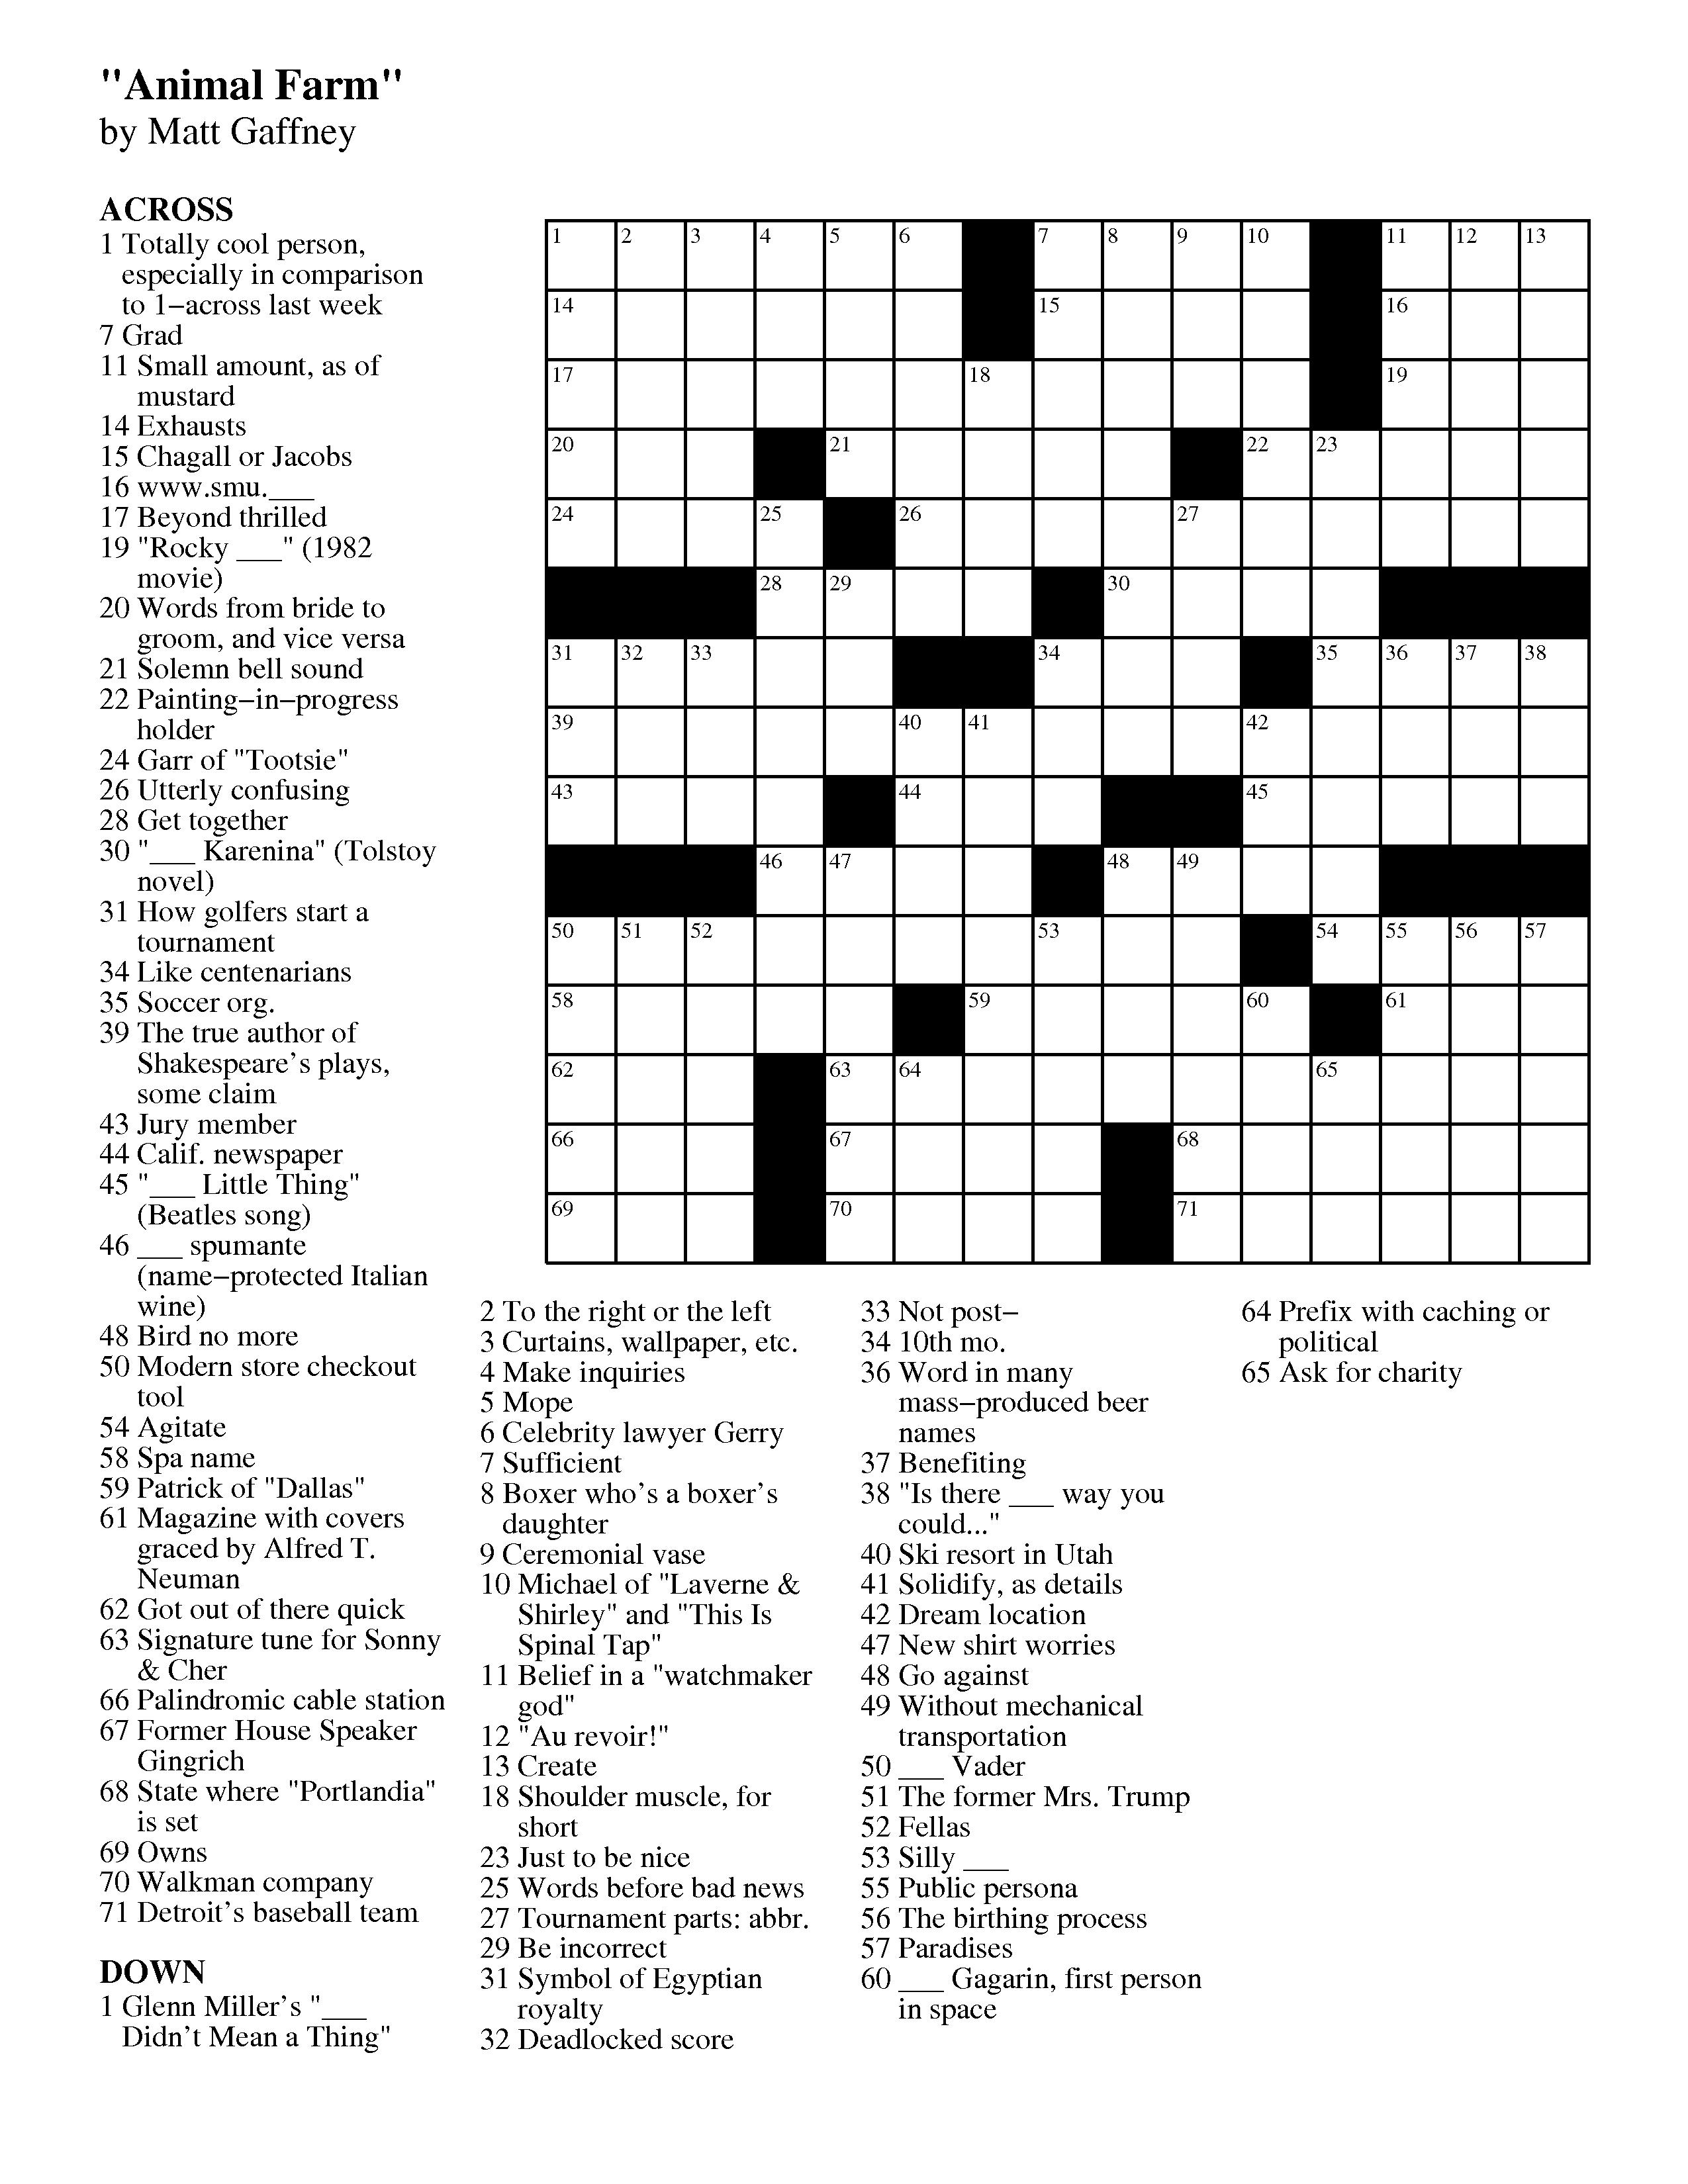 Merl Reagle's Sunday Crossword Free Printable